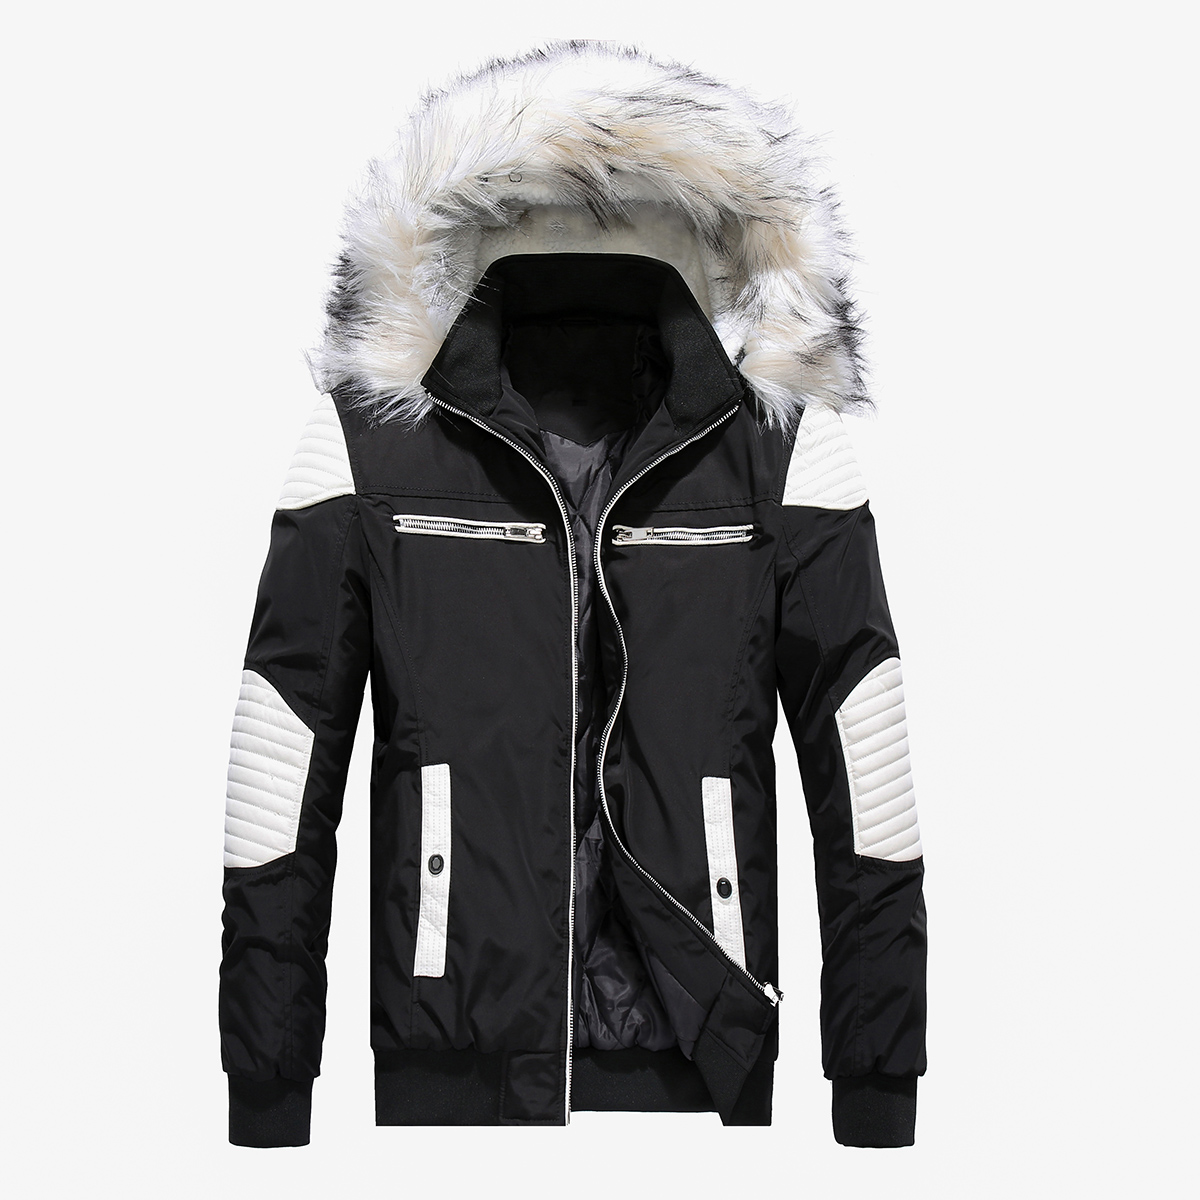 PUIMENTIUA Mens Winter Cotton Clothing Warm Fashion Cotton Stitching Jacket Large Size Fur Collar Hooded Jacket